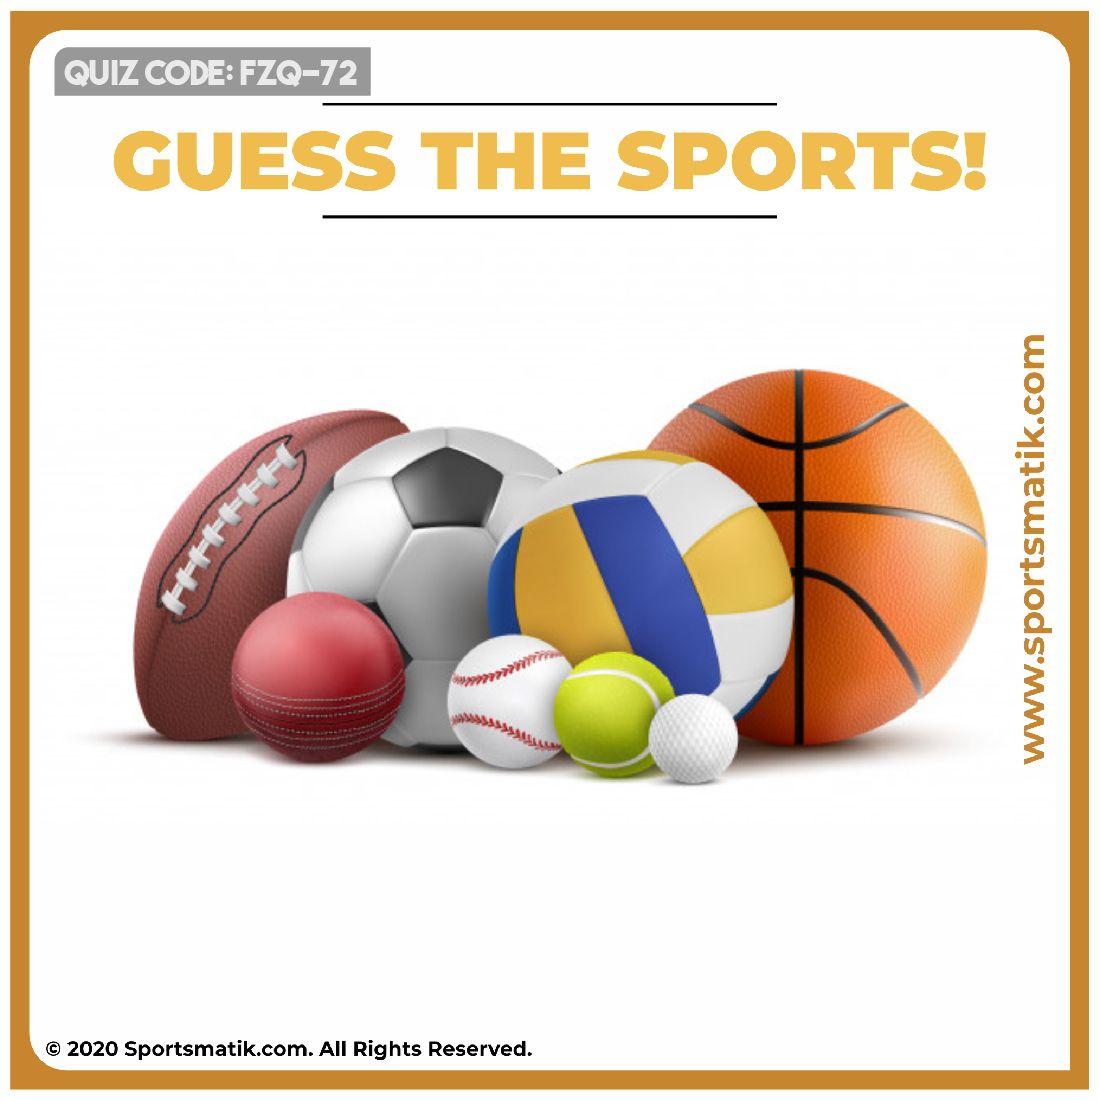 Guess sports! in 2020 Sports quiz, Sports website, Sports